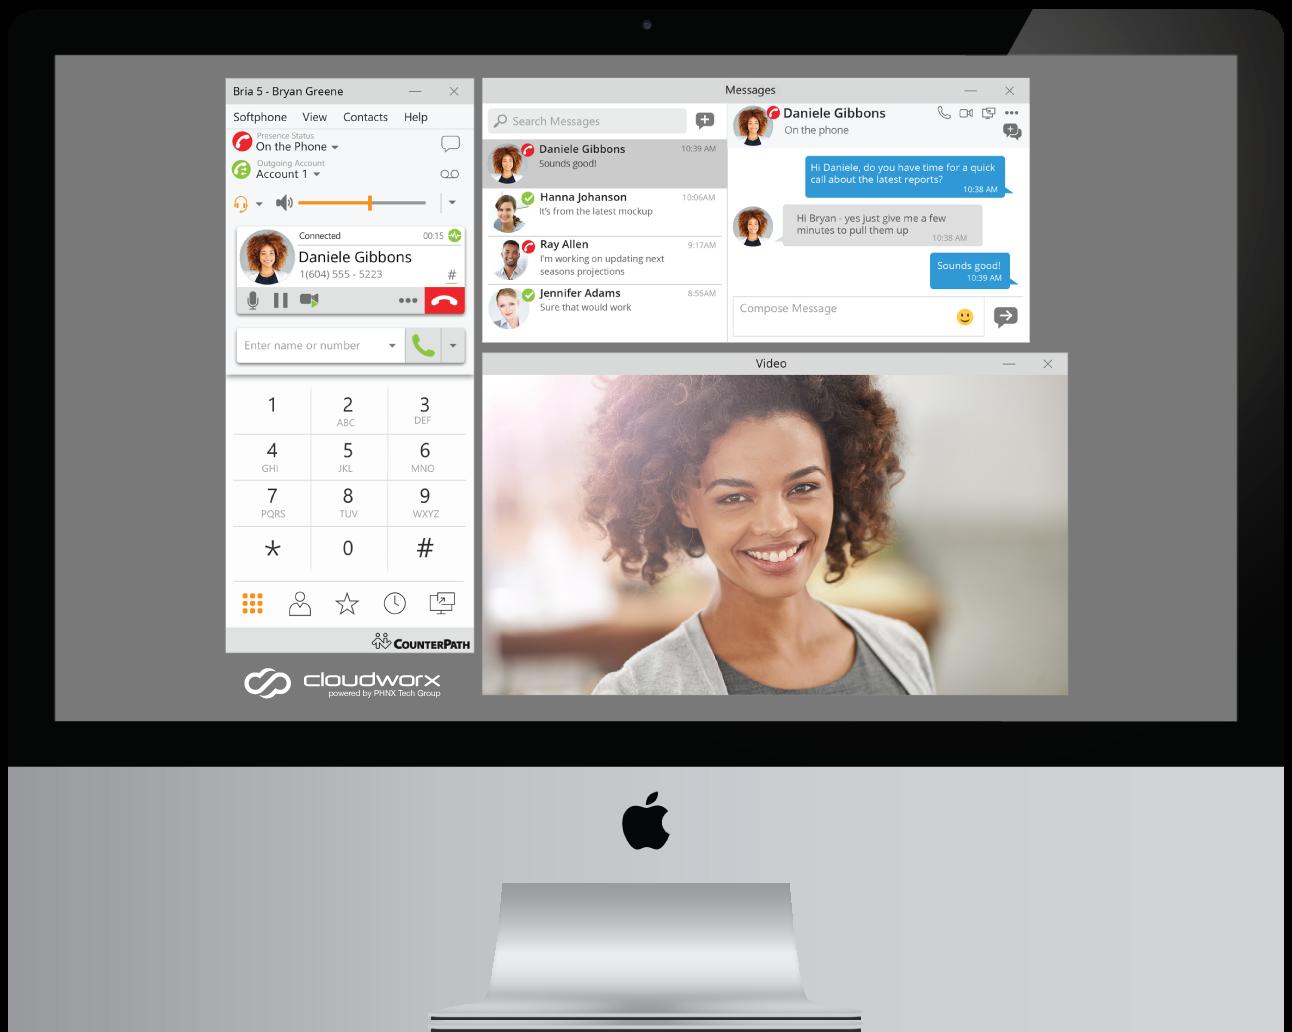 Bria-MAC-Desktop-Unified-Communications